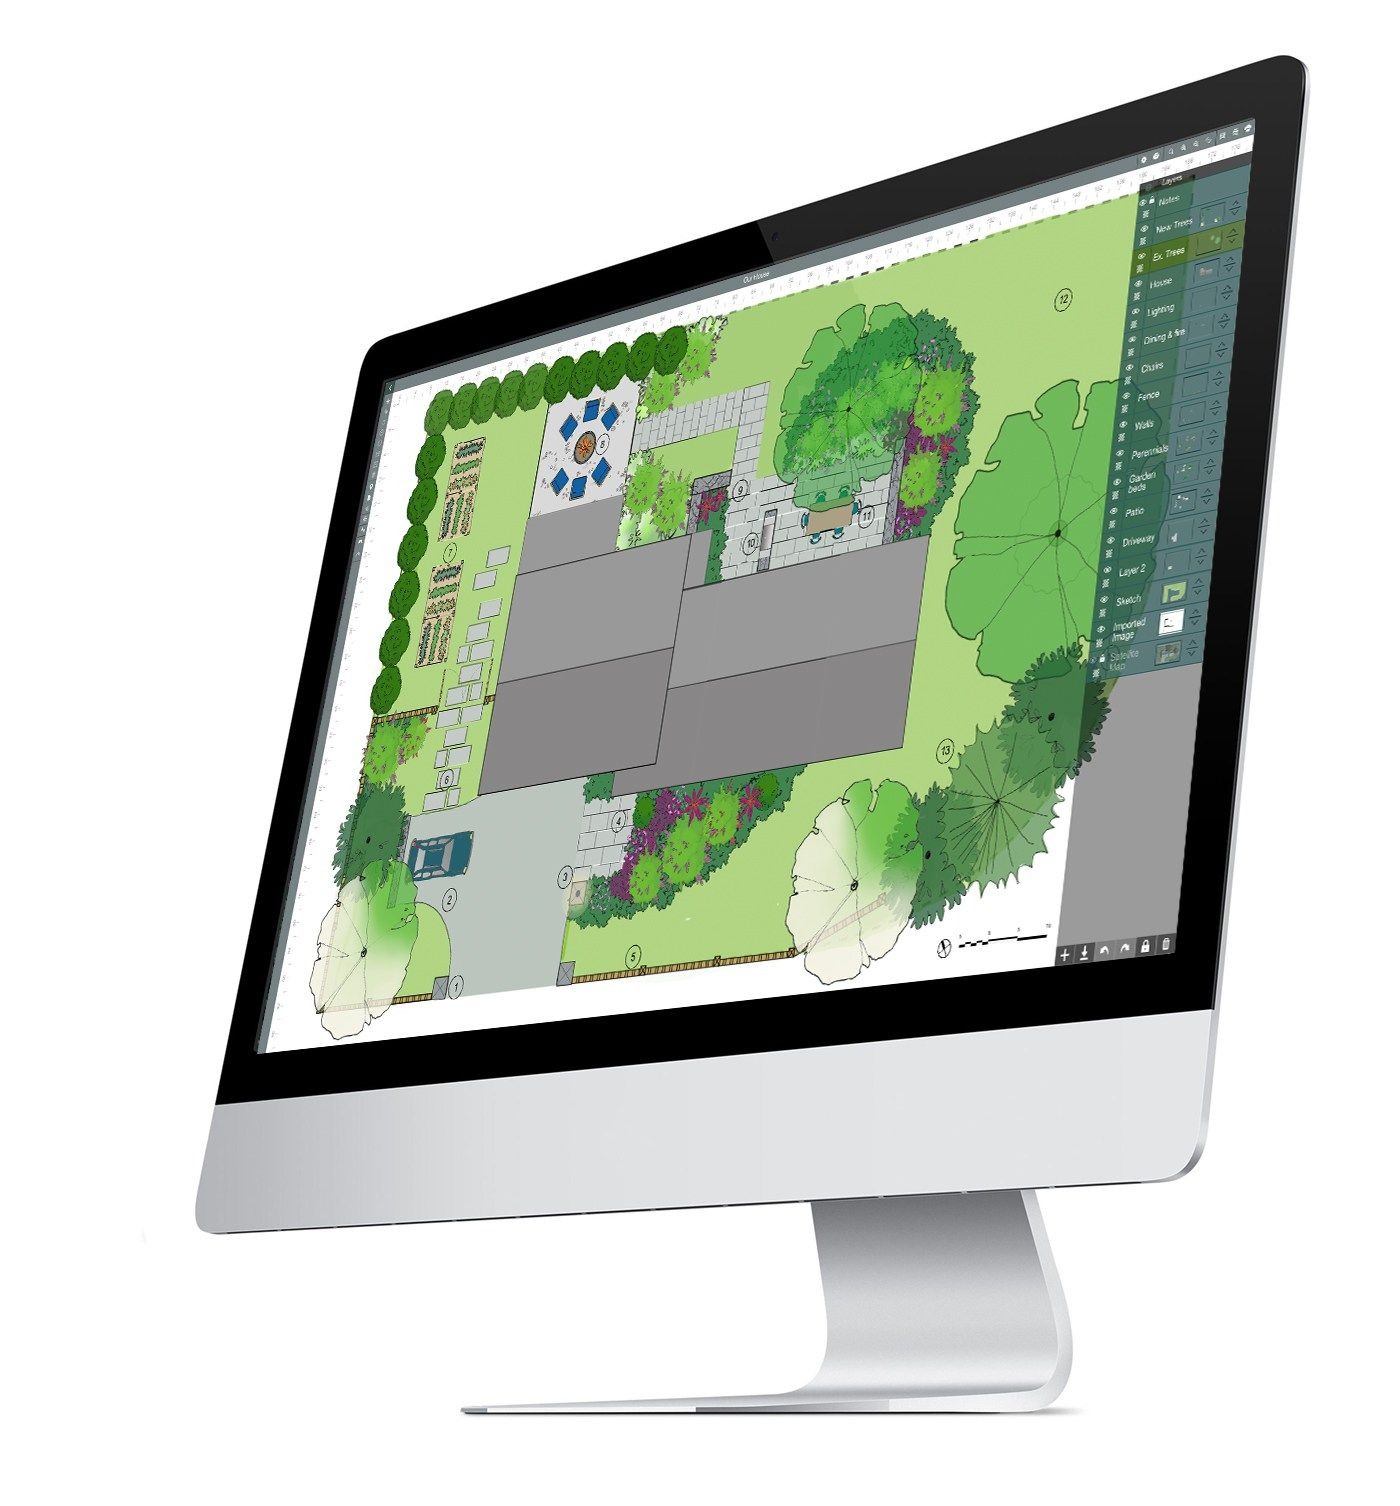 landscape software on Mac desktop computer | Mac desktop ...